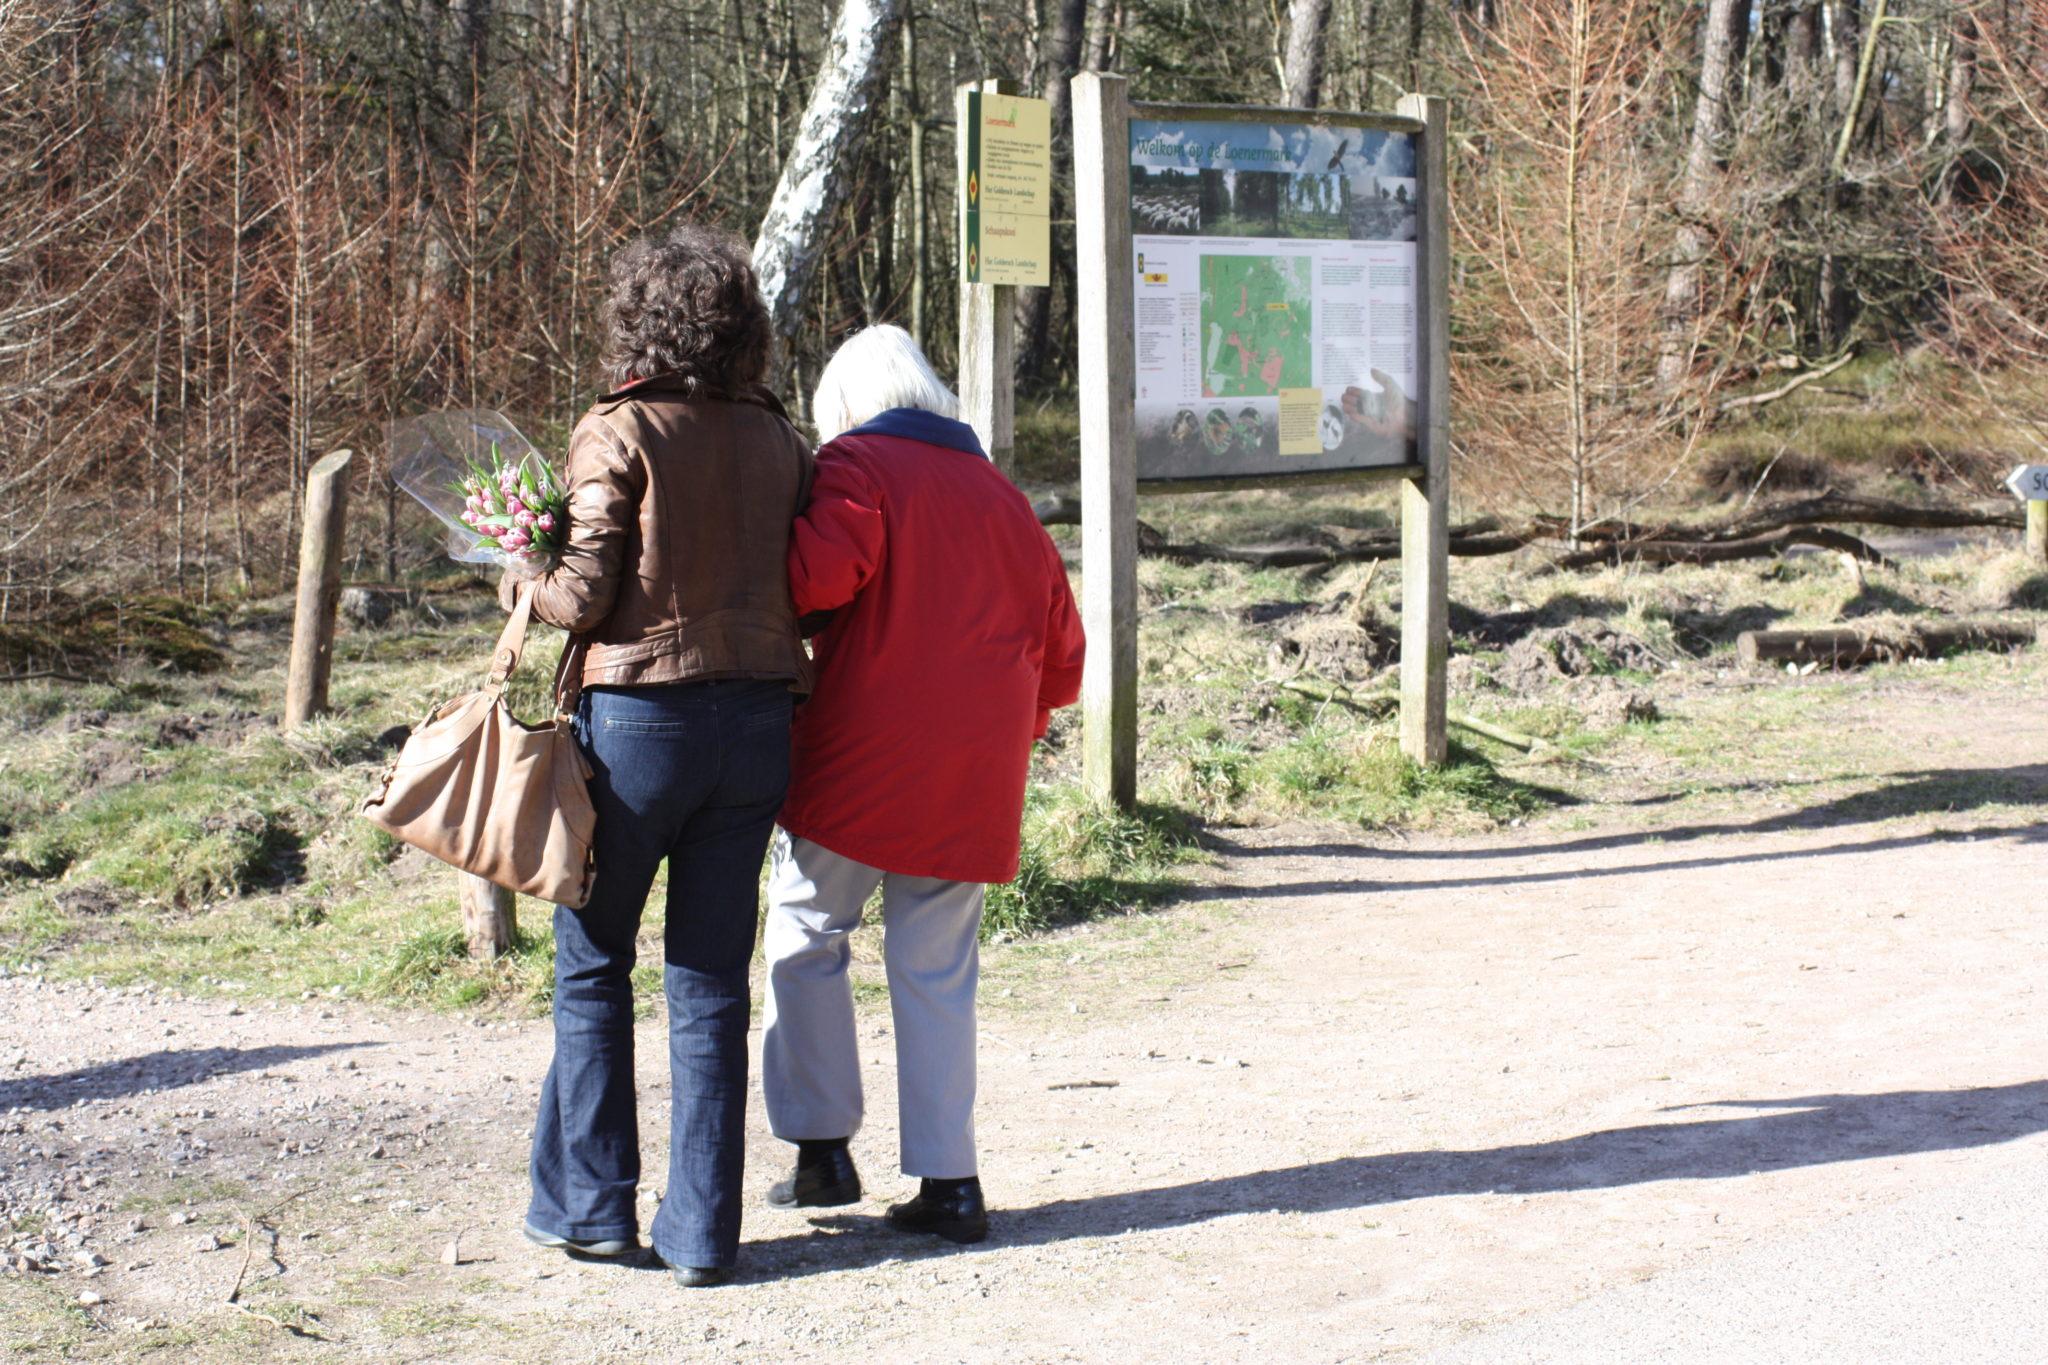 Vrijwilliger Villa Oosterveld - Stepping Stones Home & Care Stepping Stones Home Care